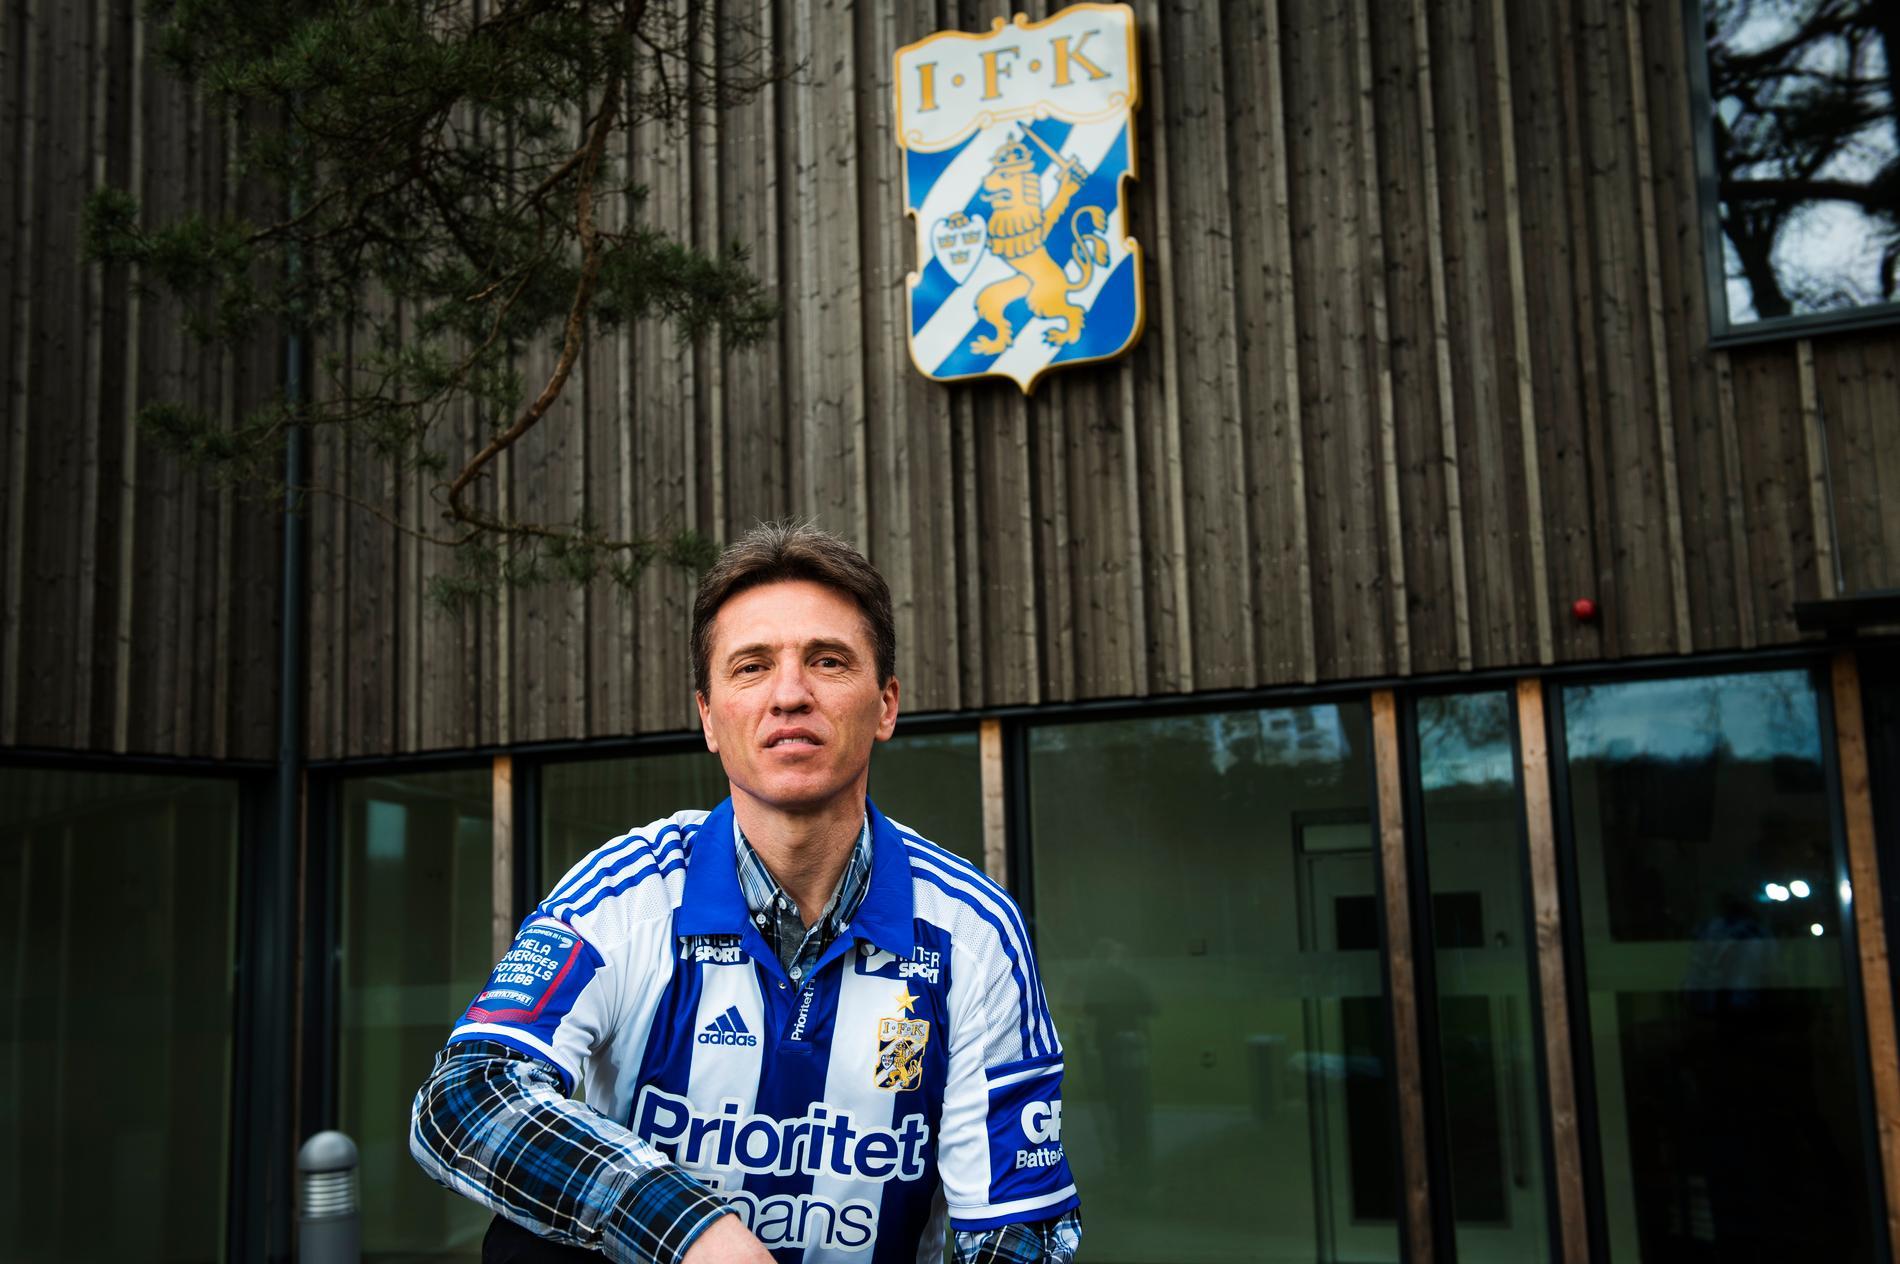 Tidigare i år presenterades Mats Gren som IFK Göteborgs nye sportchef.